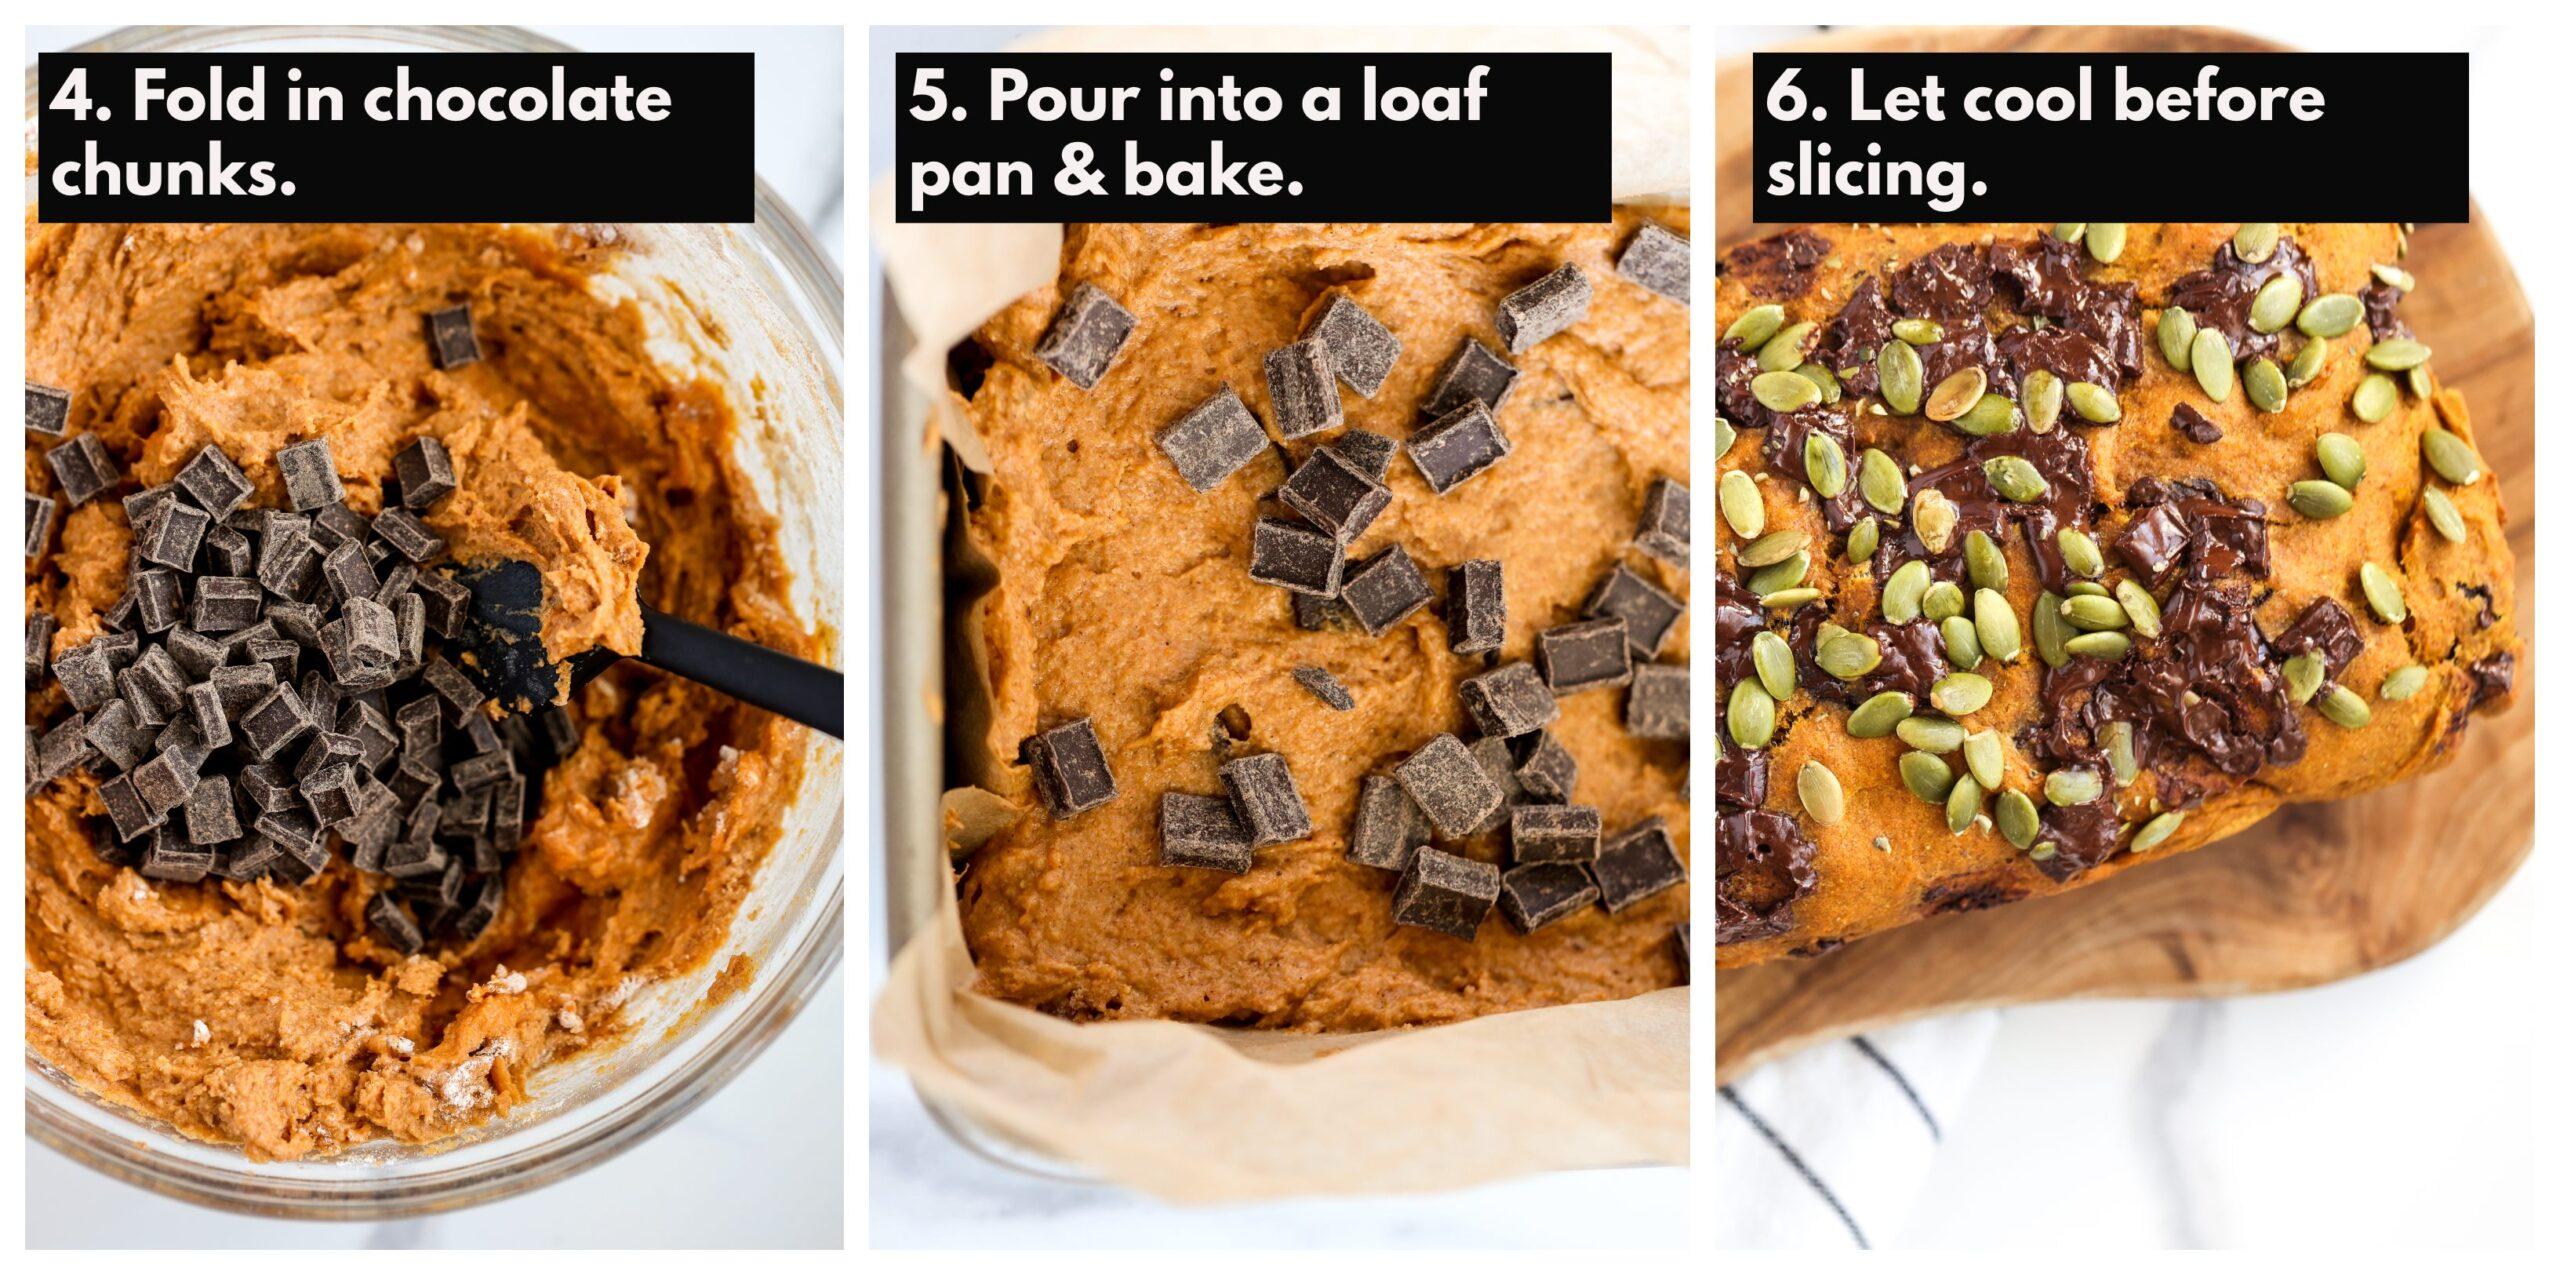 Process shots to make pumpkin bread.